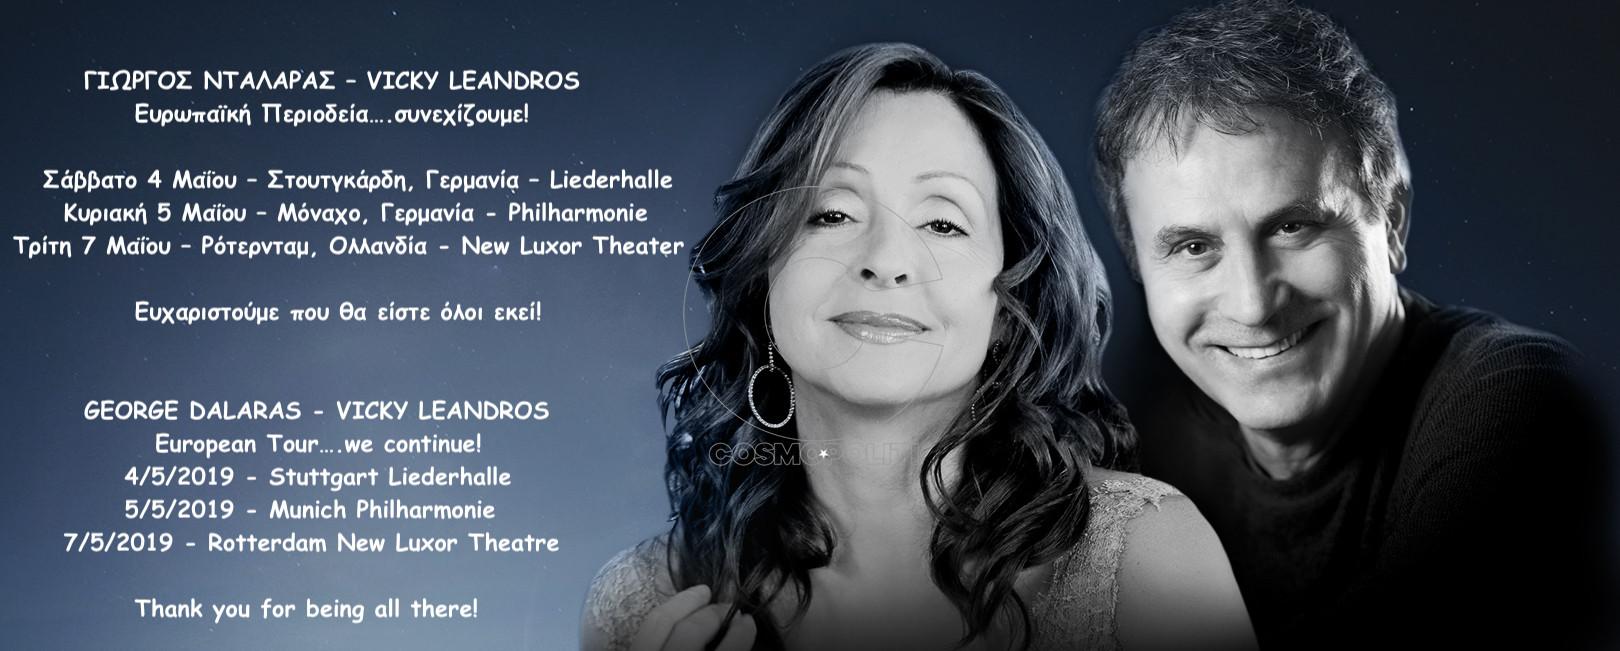 George Dalaras-Vicky Leandros 2019 tour